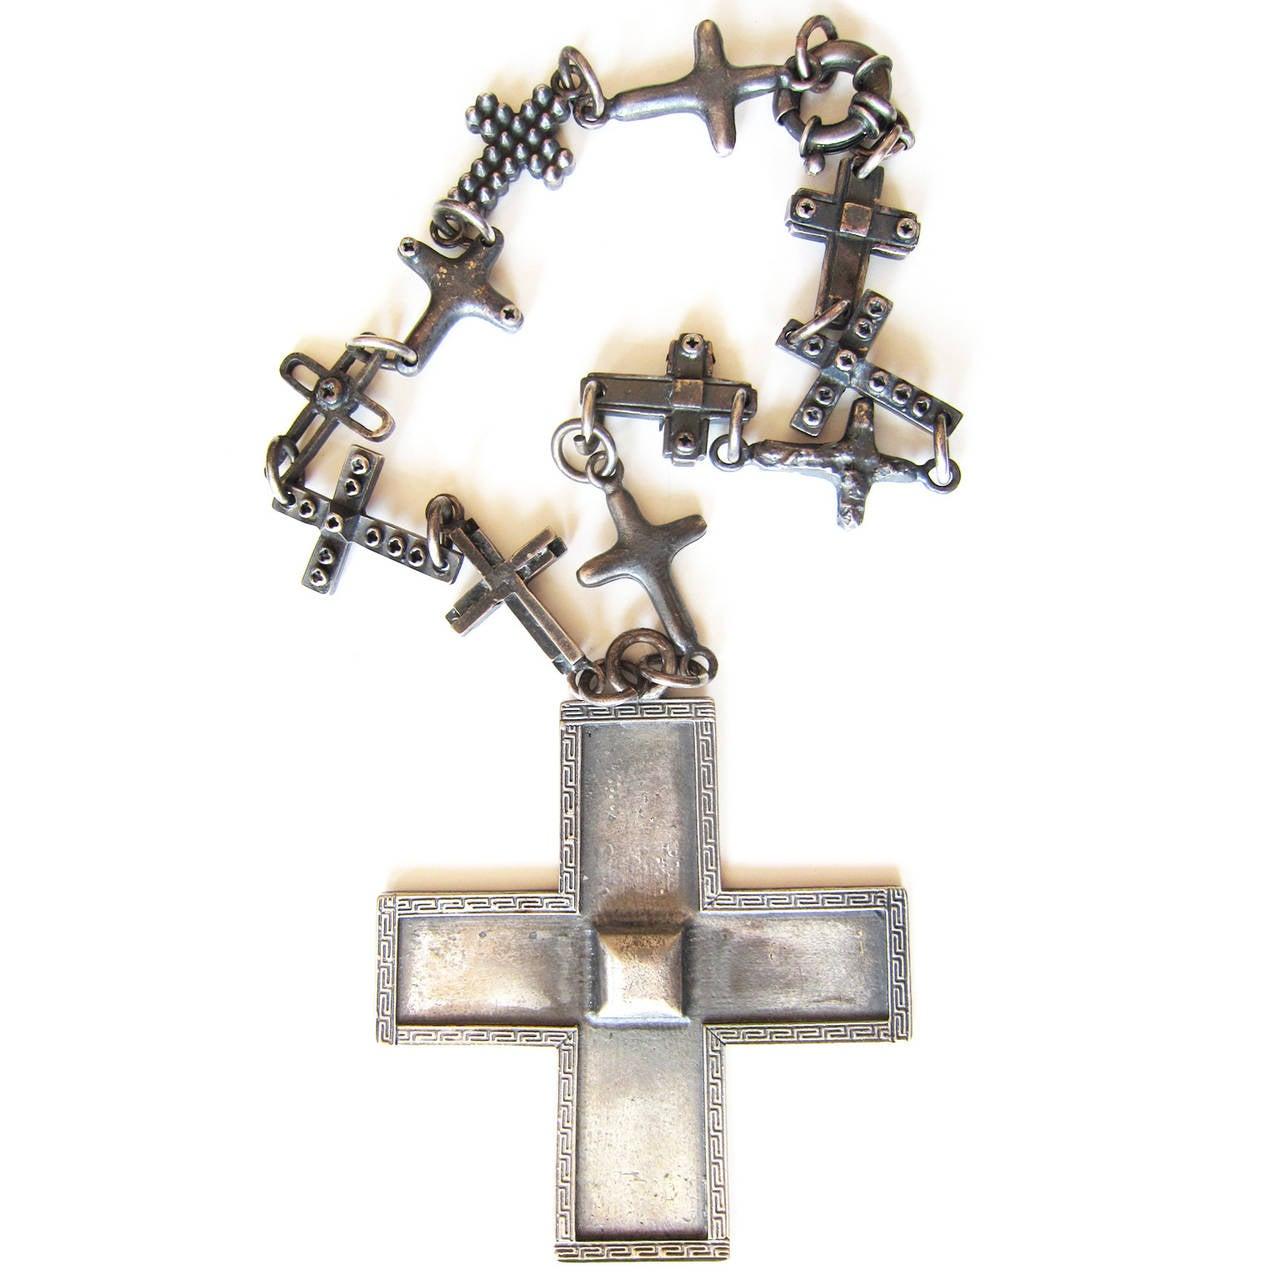 Gianni Versace Massive Cross Necklace 1990's 4